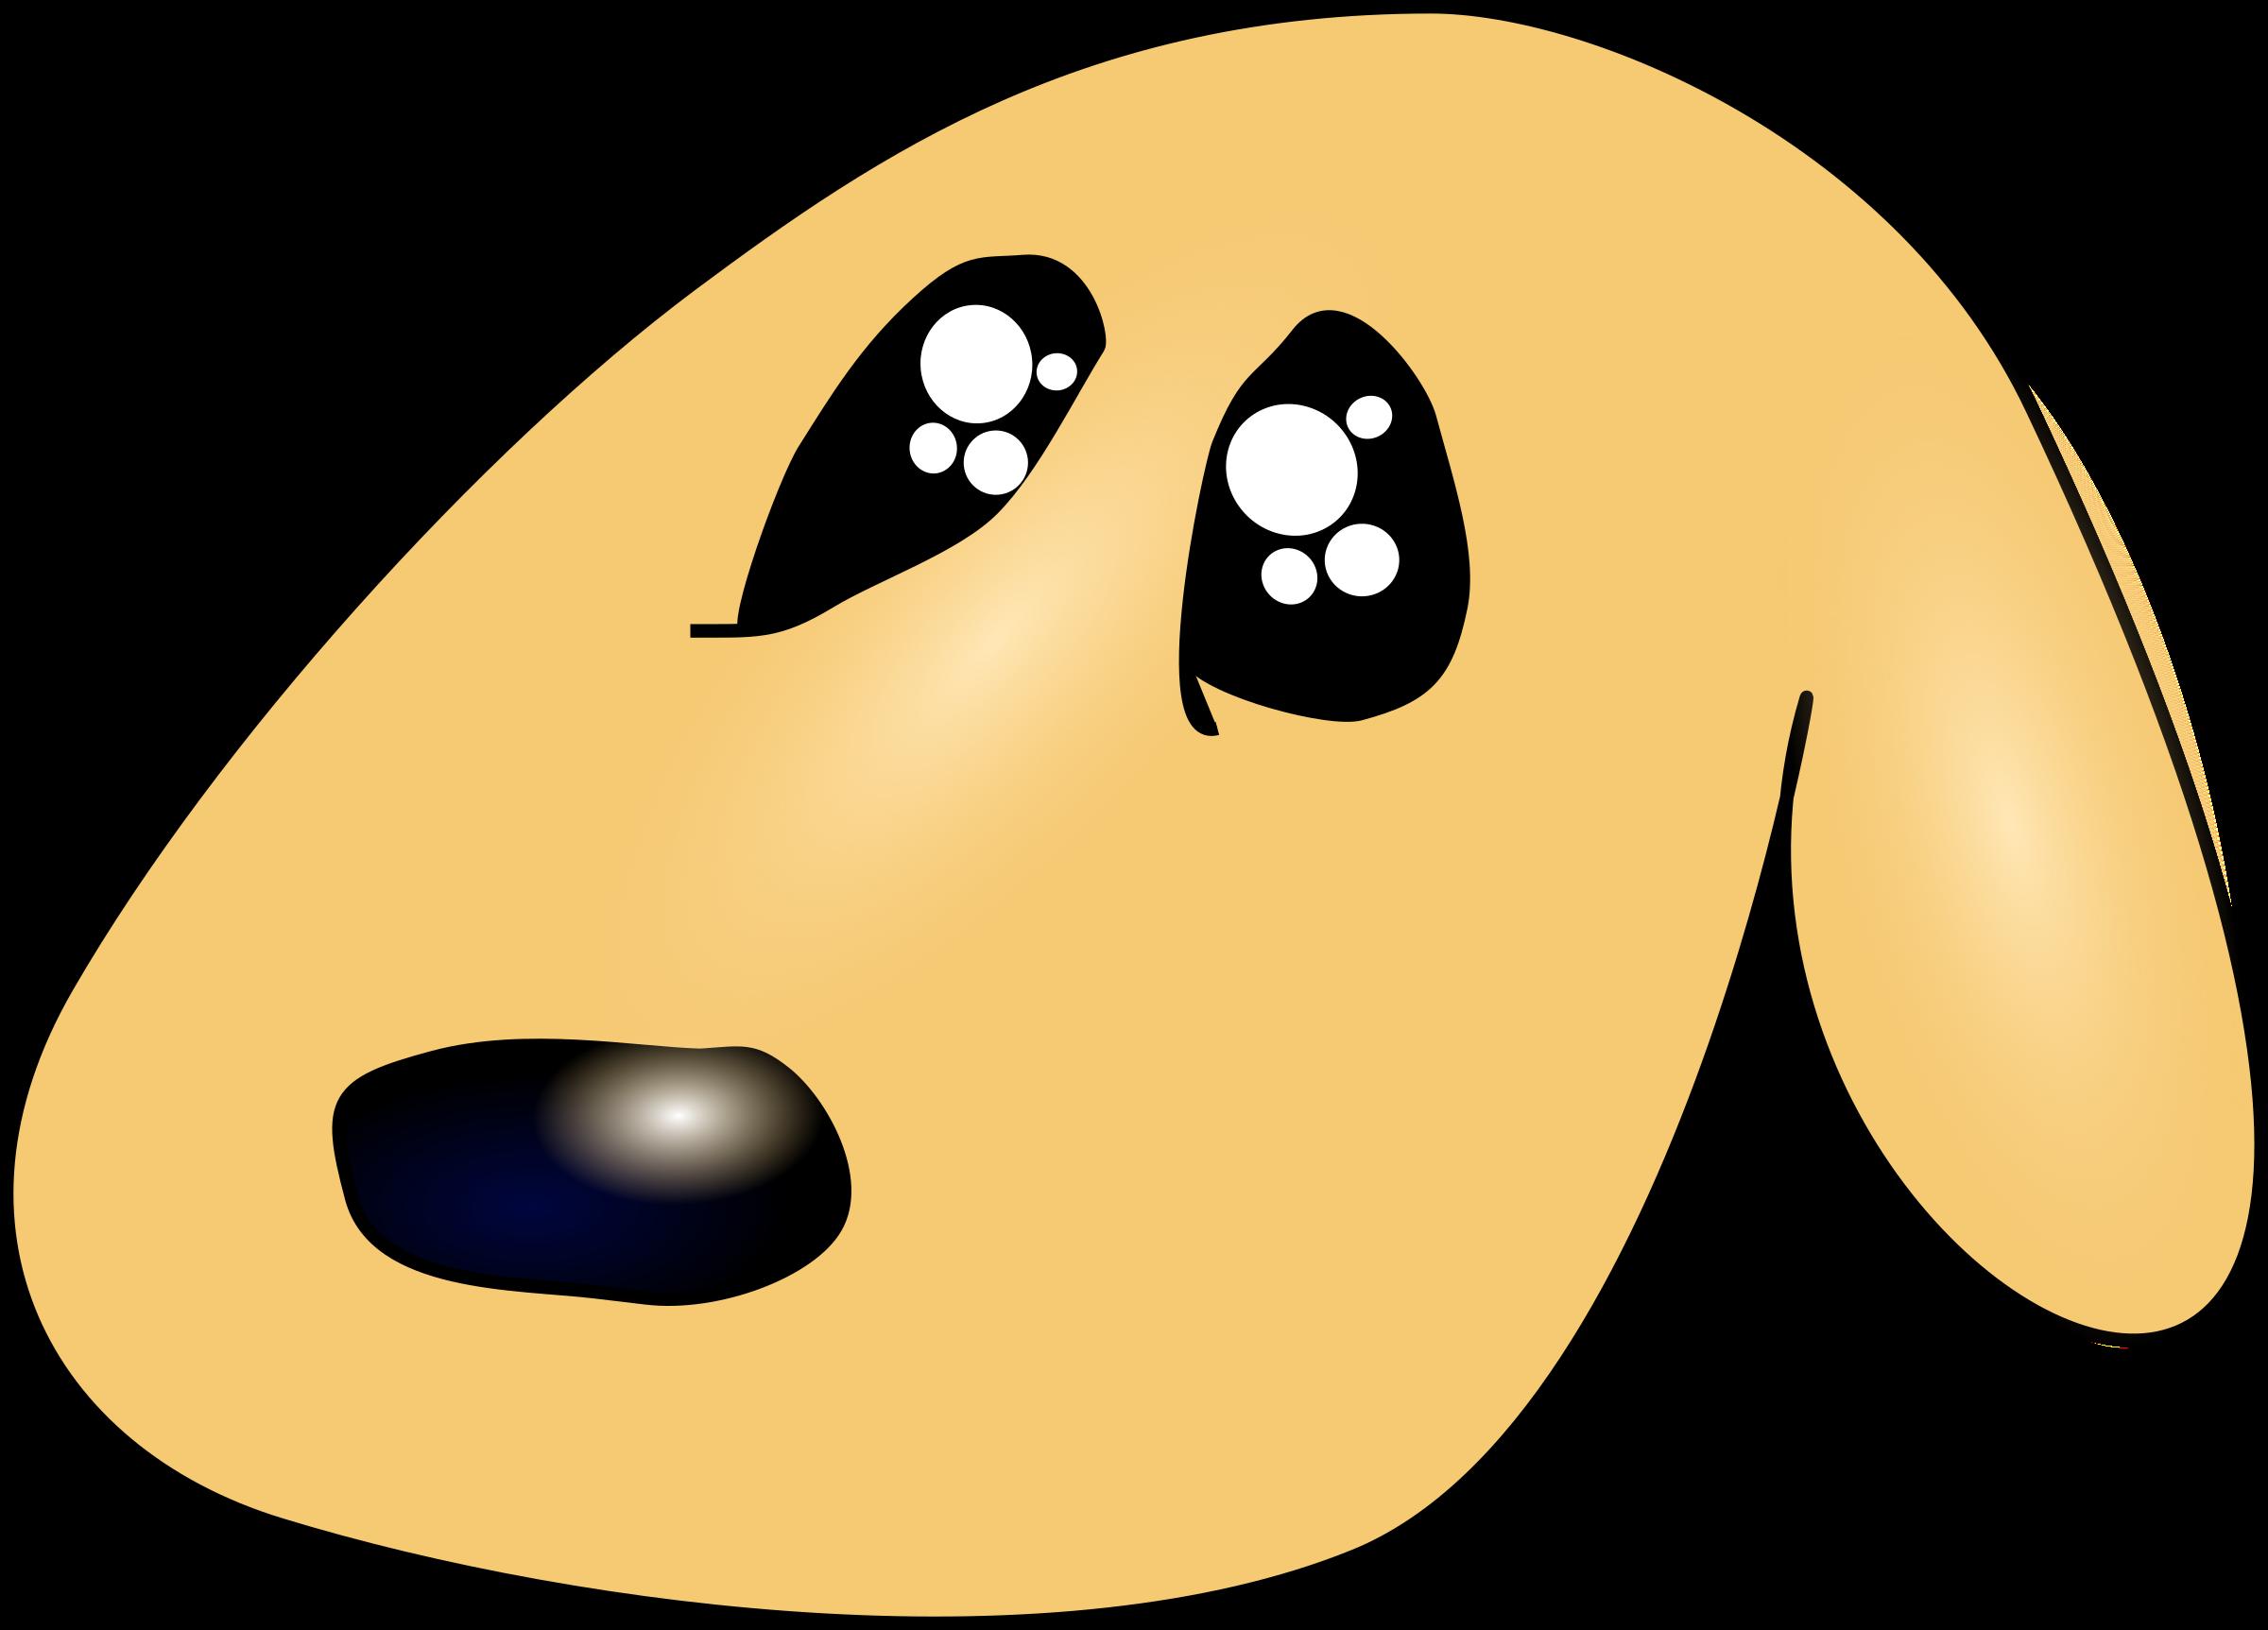 Cute dog face clipart graphic transparent download Clipart - Cute sad dog graphic transparent download